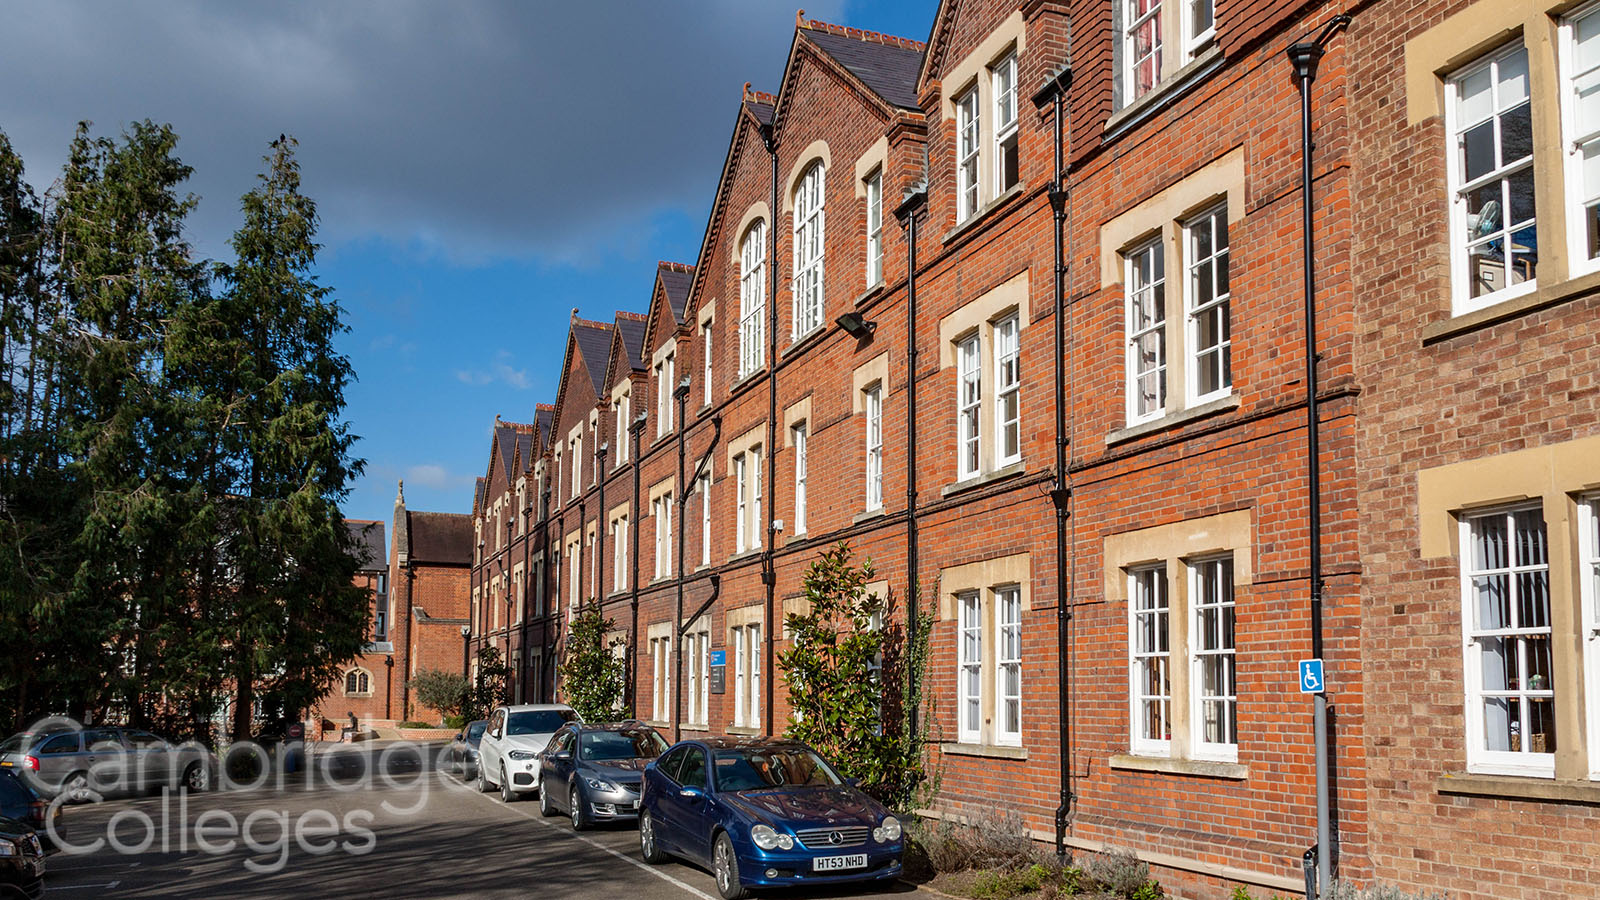 The Norfolk Building, St Edmund's college, Cambridge